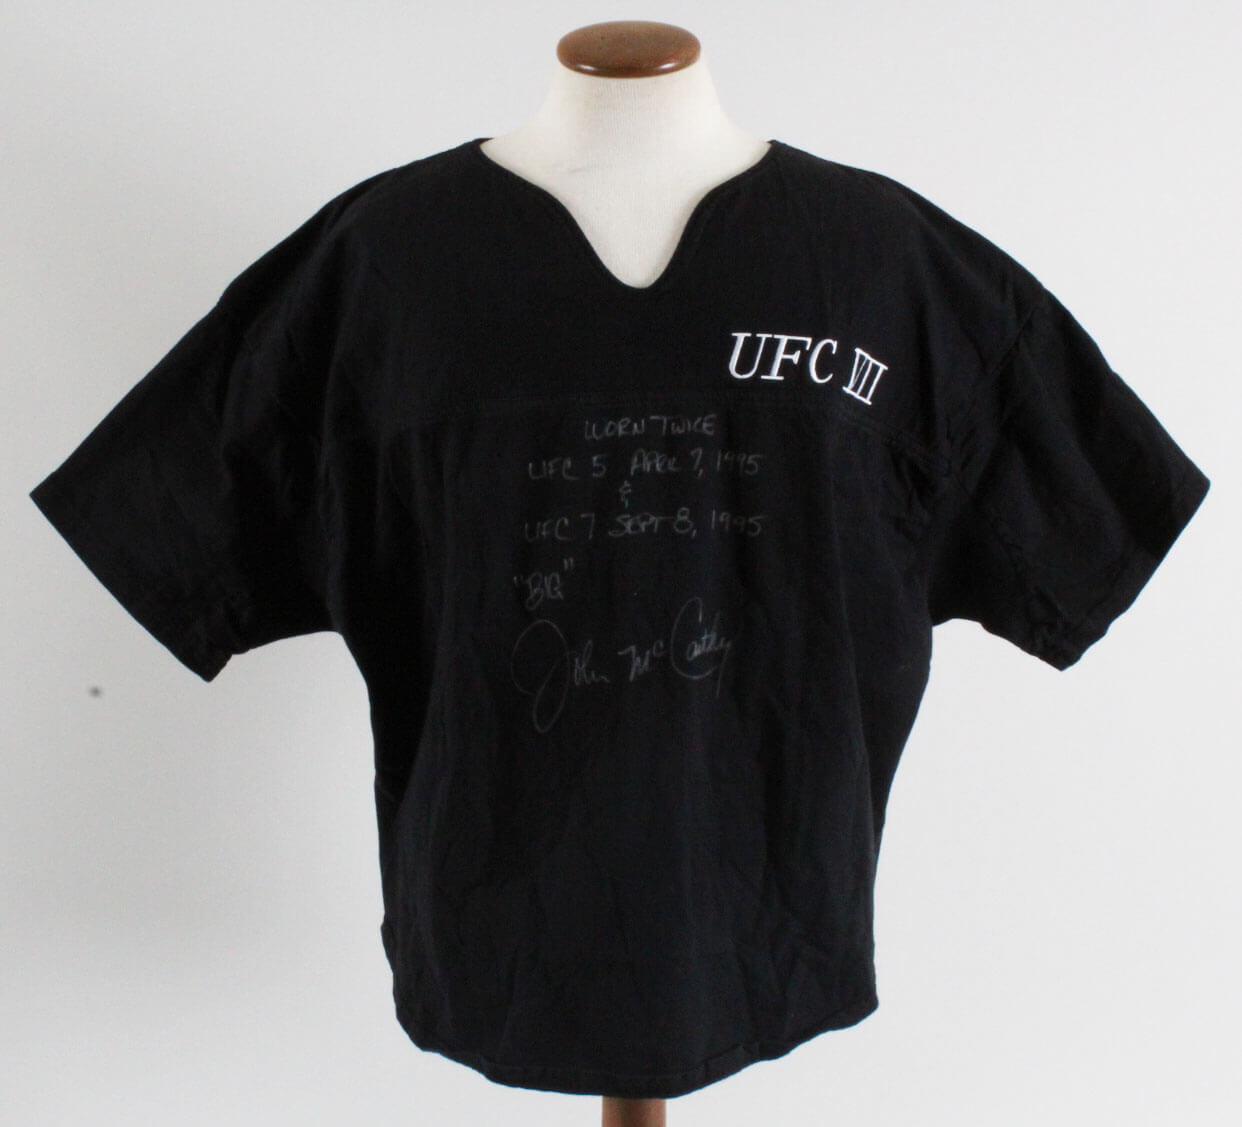 Big John McCarthy Fight-Worn (Twice), Signed Shirt - Used in UFC 5: The Return of the Beast & UFC 7: The Brawl in Buffalo